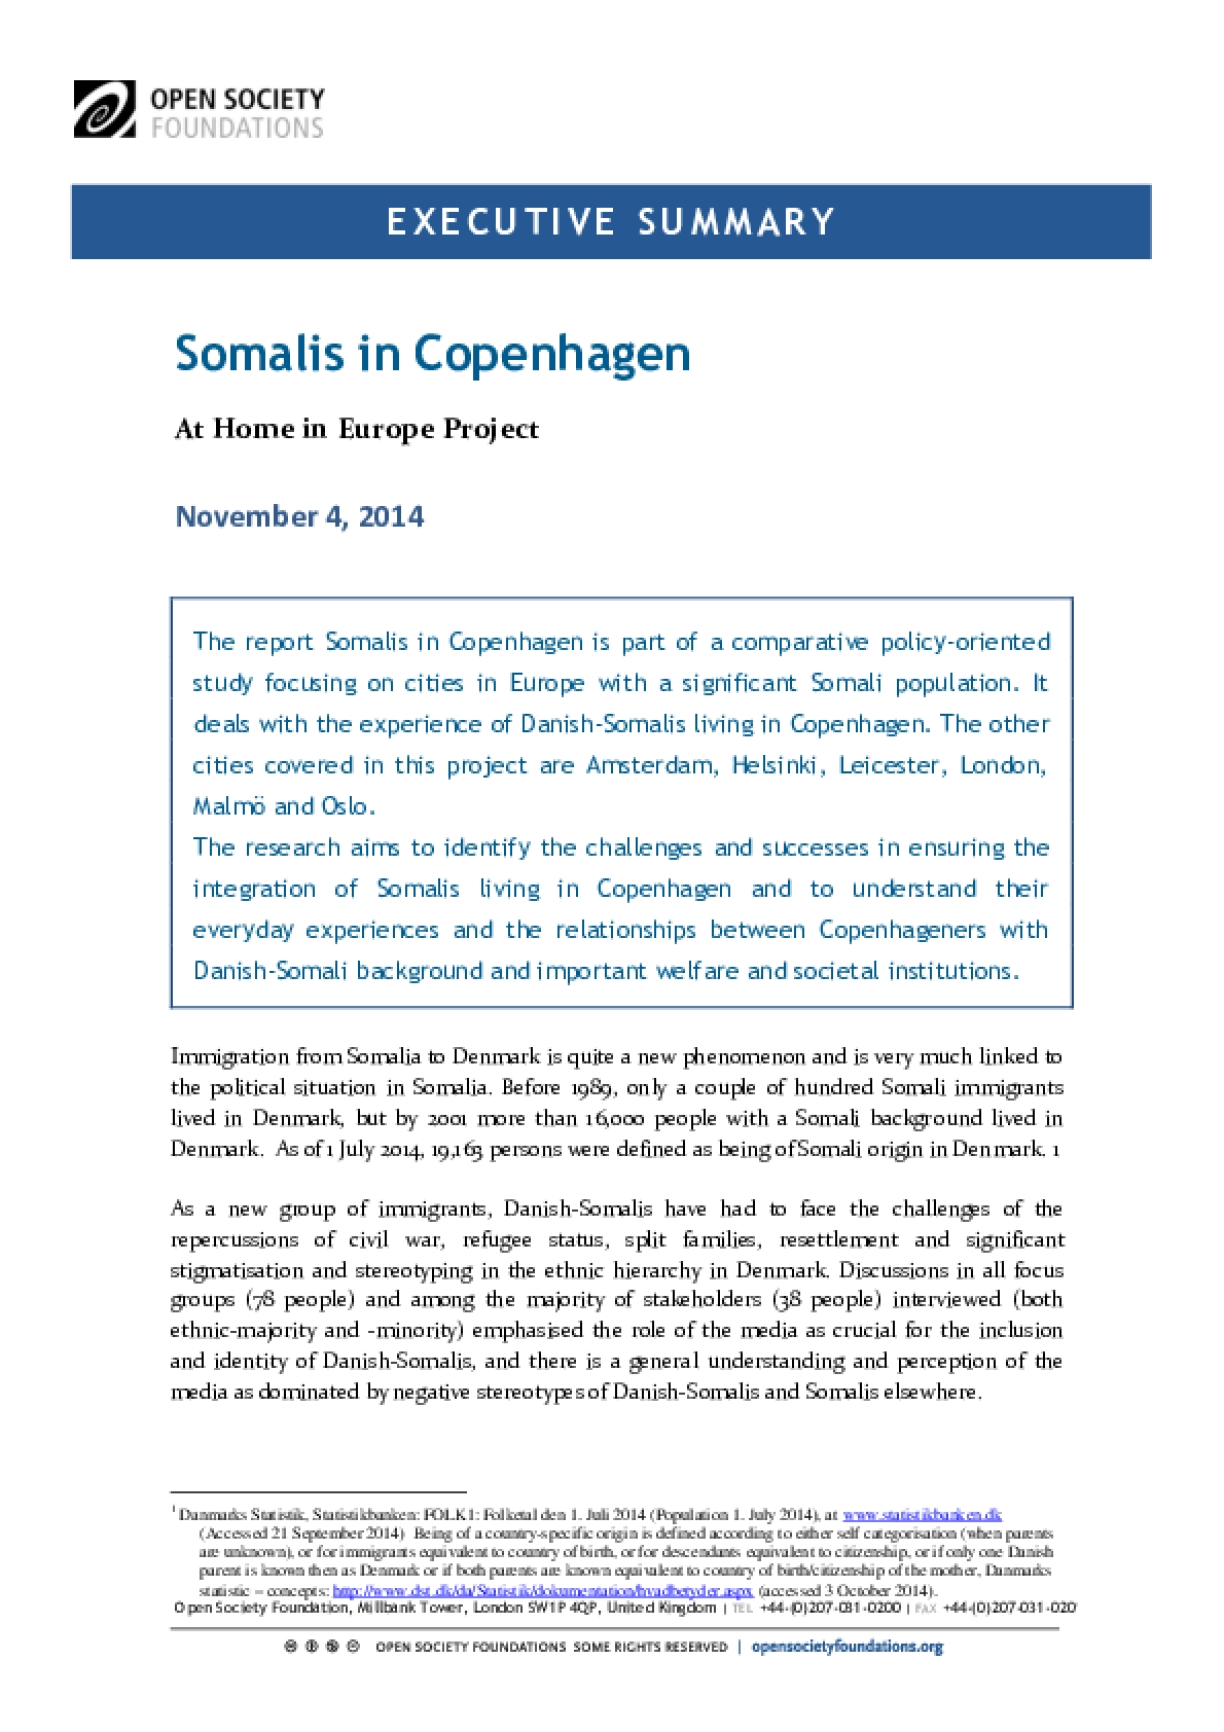 Somalis in Copenhagen: Executive Summary